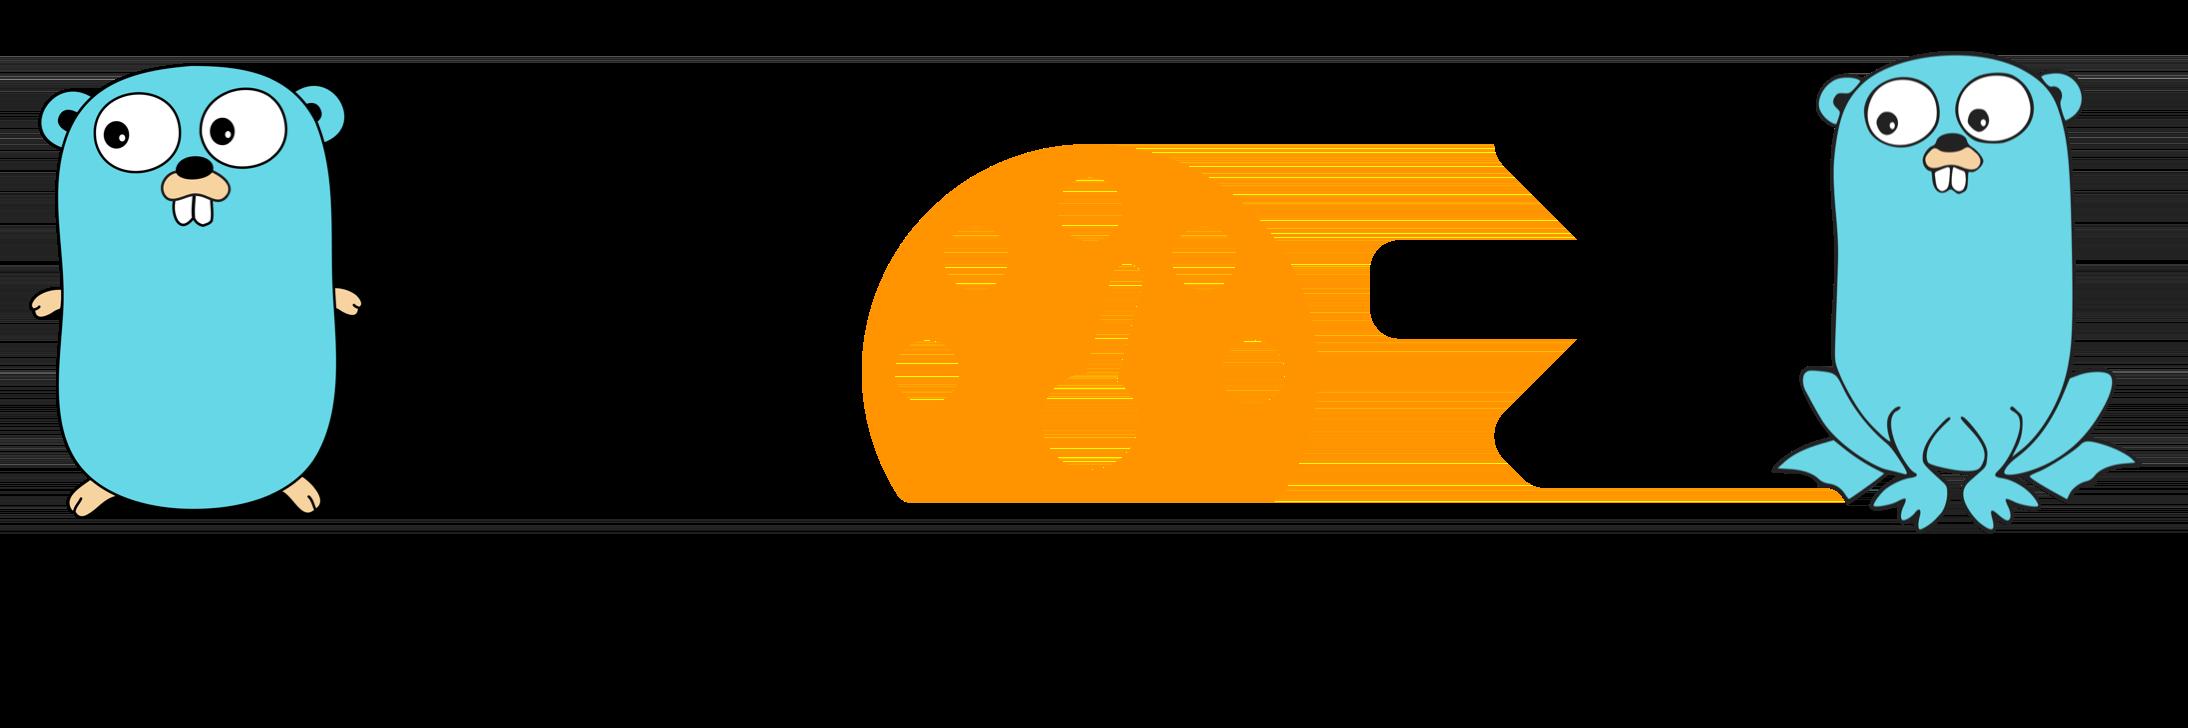 Goad logo